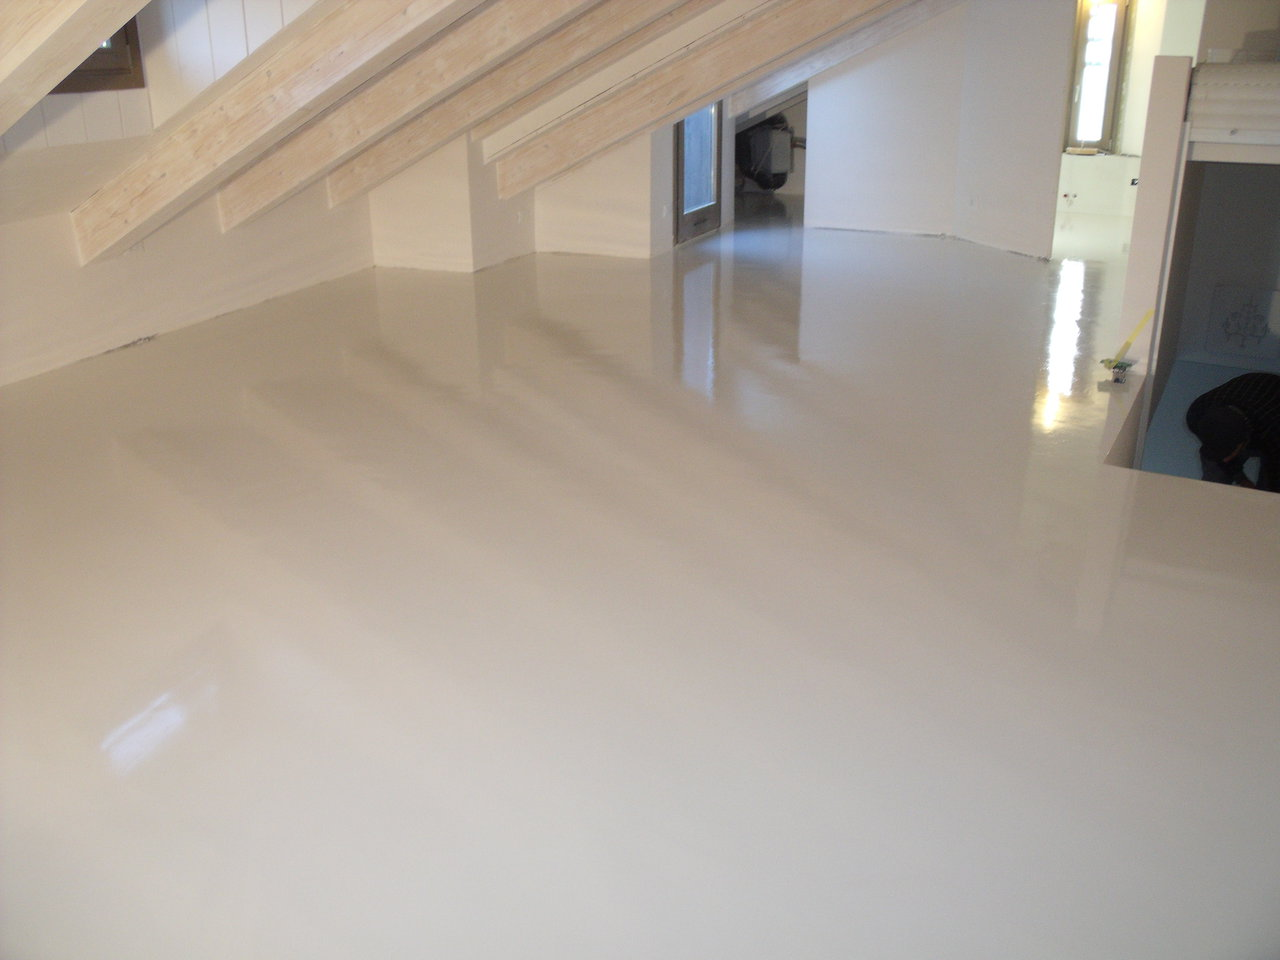 Pavimento Bianco Lucido Prezzo : Pavimento bianco lucido prezzo piastrelle soggiorno pavimento in